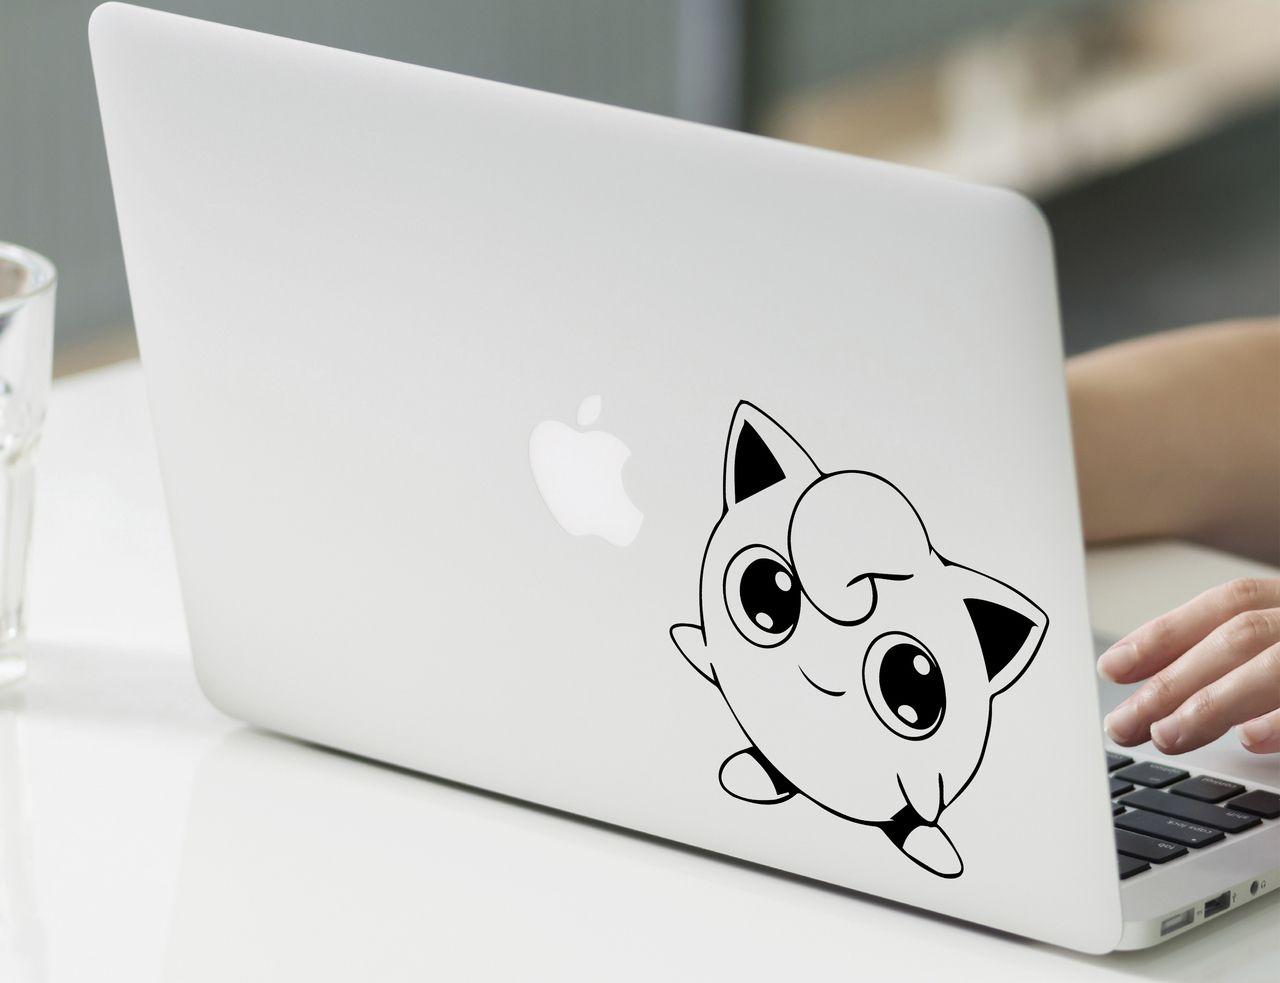 "Jigglypuff Pokemon Decal Sticker Vinyl For Macbook Pro Air 13"" Inch 15"" Inch #cute #jigglypuff #macuser #cuteanime"